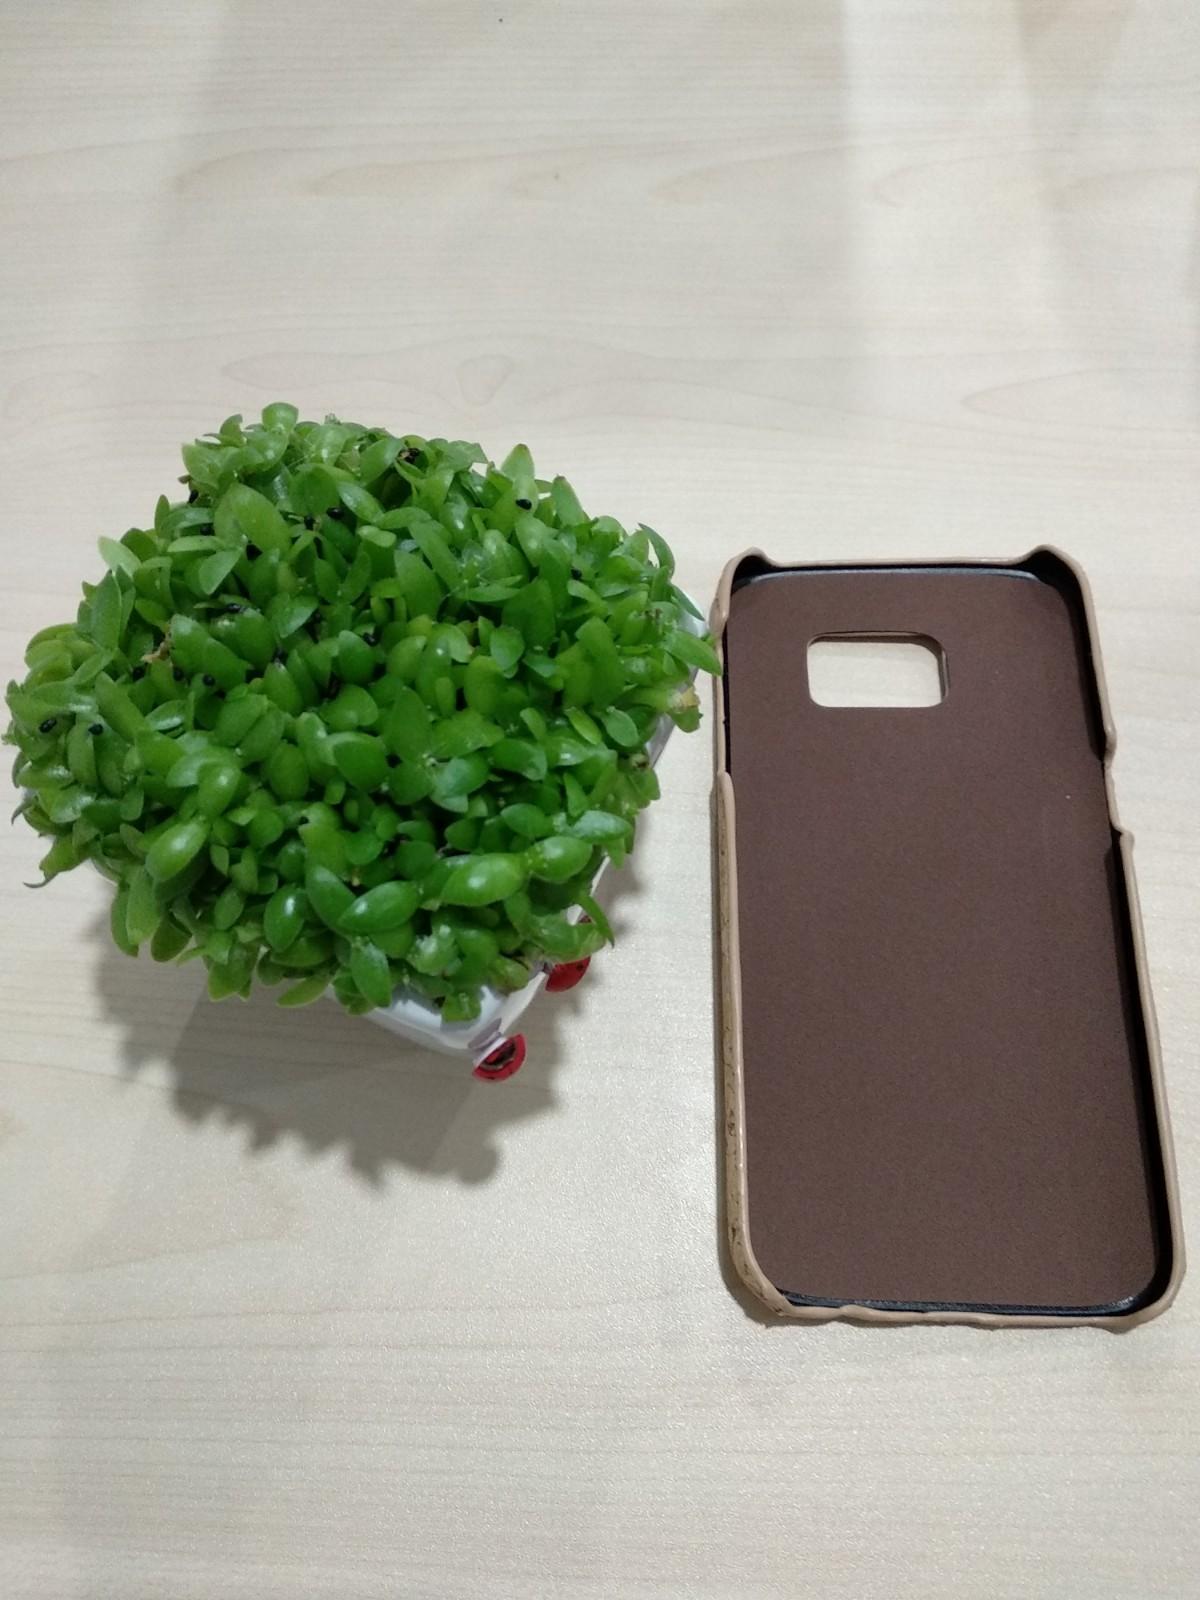 EcoQuote Samsung Galaxy S7 Handmade Phone Case Hard PC Cork Finishing for Vegan